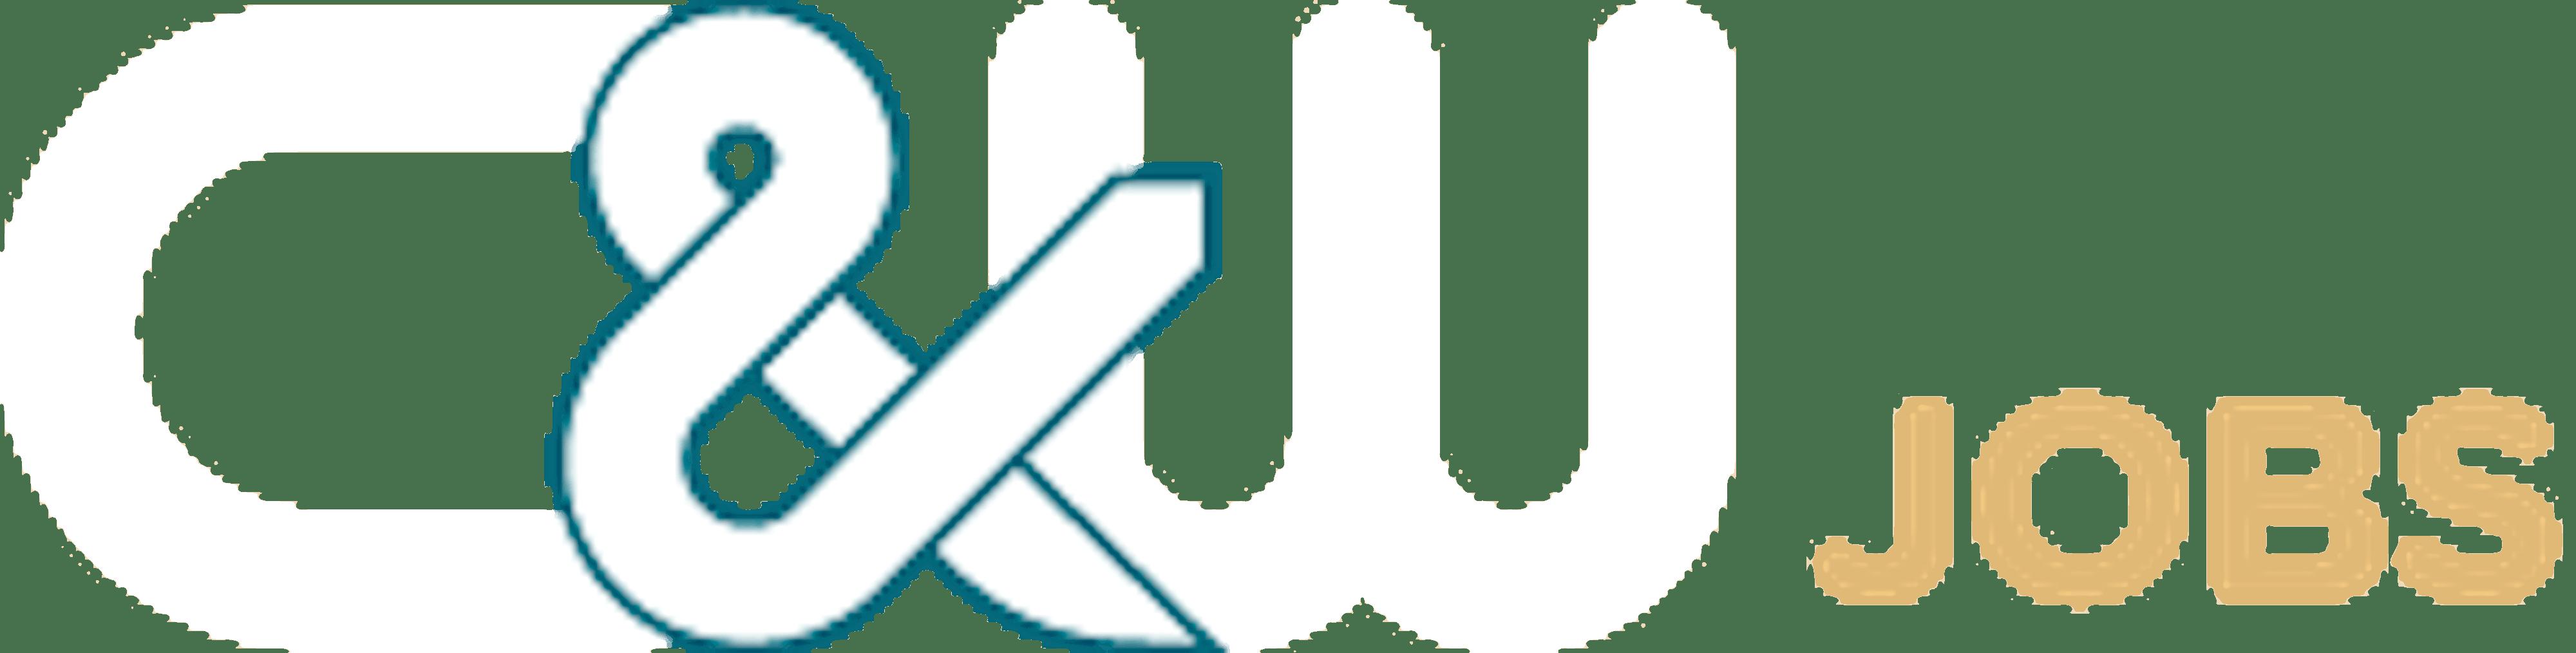 C&W Logistics logo